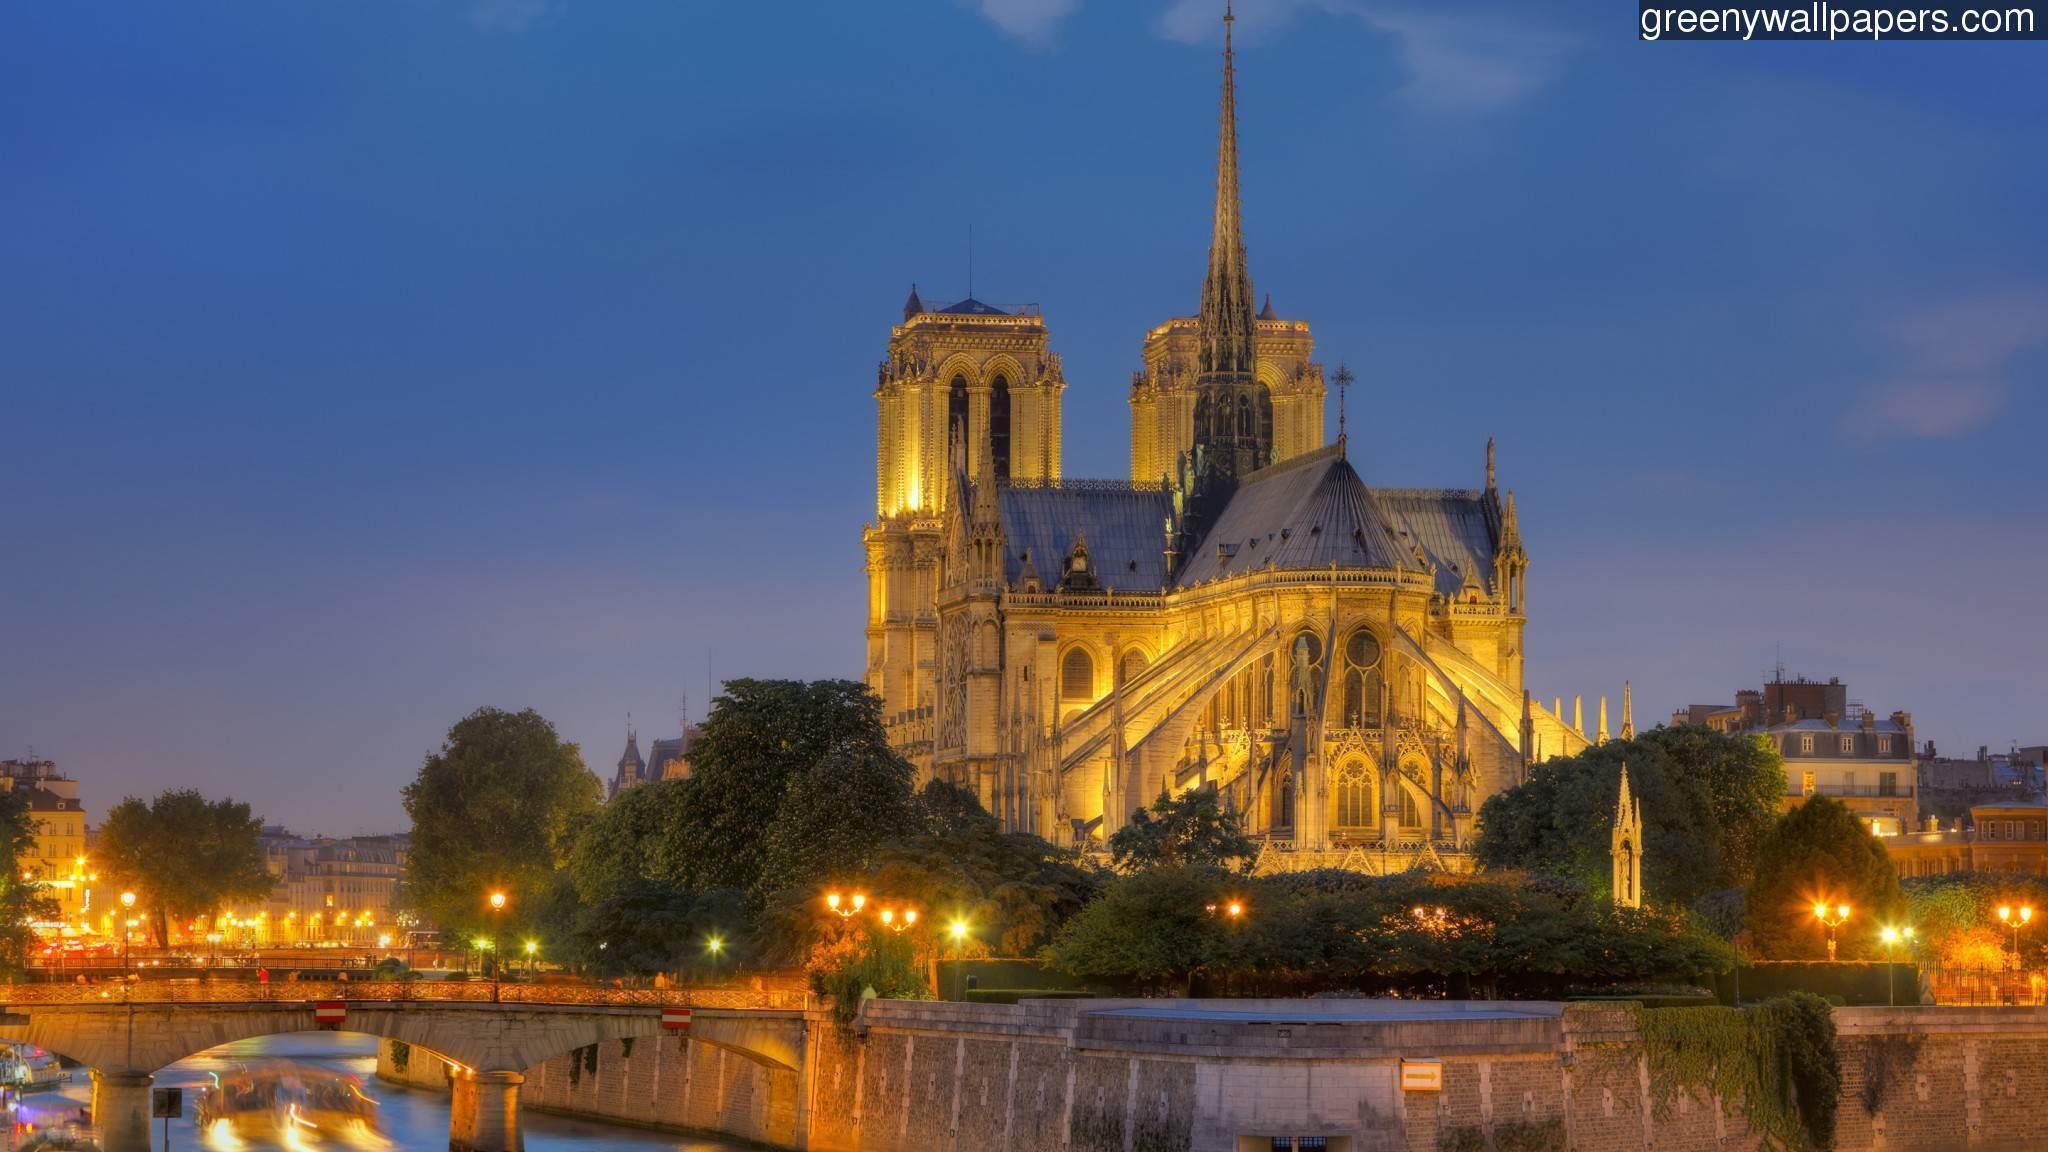 Notre Dame Screen Wallpaper (54 Wallpapers) - Adorable ...